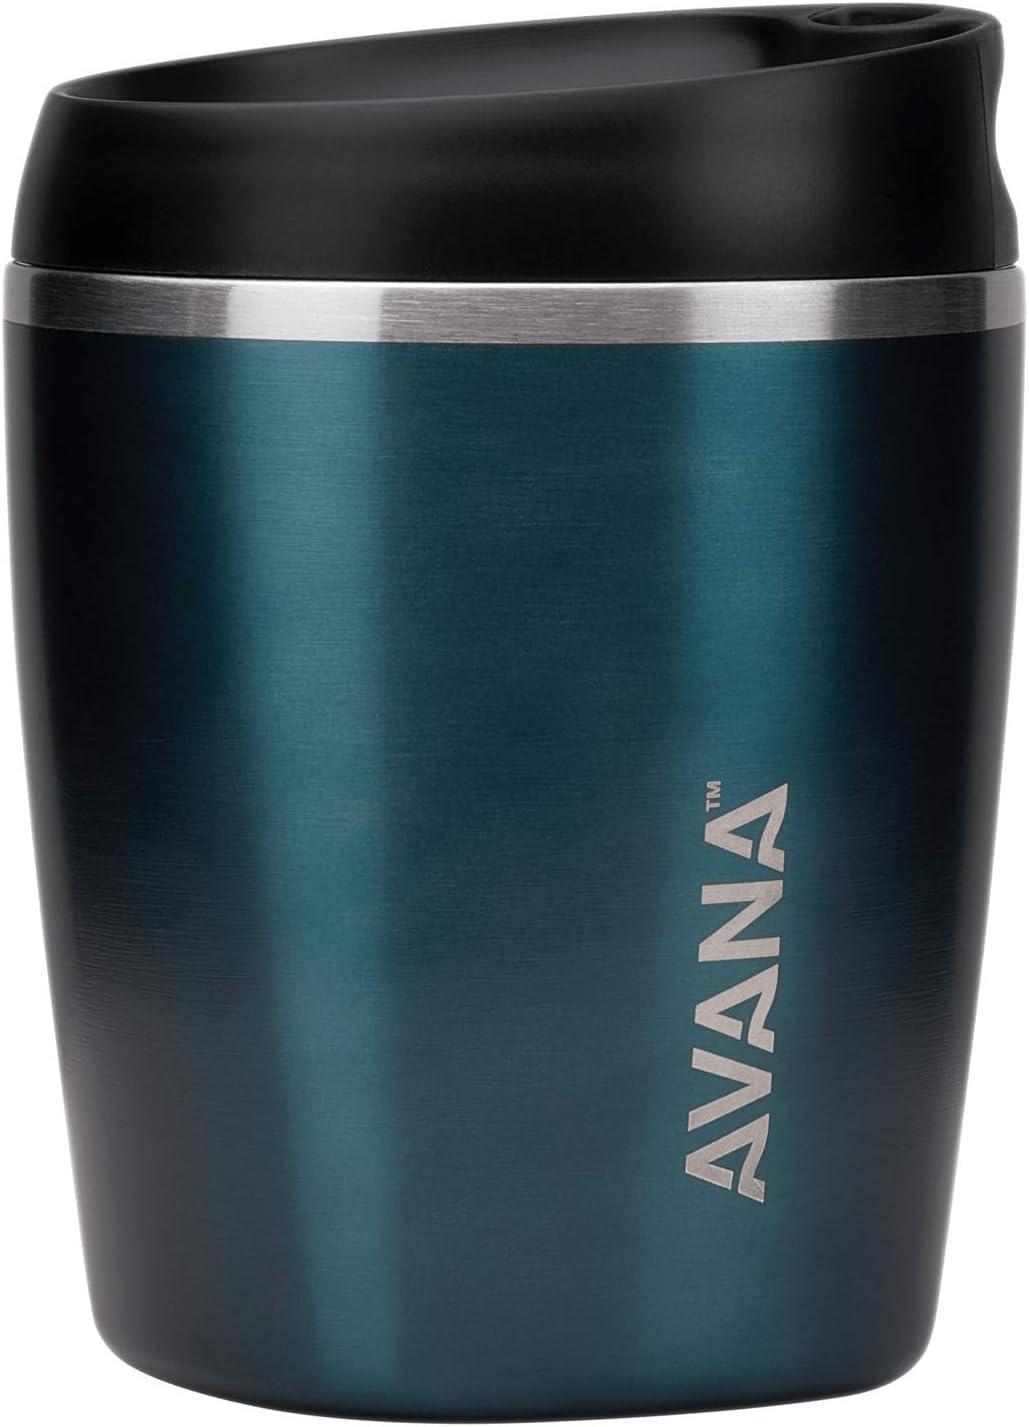 Avana Sedona Stainless Steel Double-Wall Insulated Thermal Tumbler, 10-Ounce, Deep Ocean